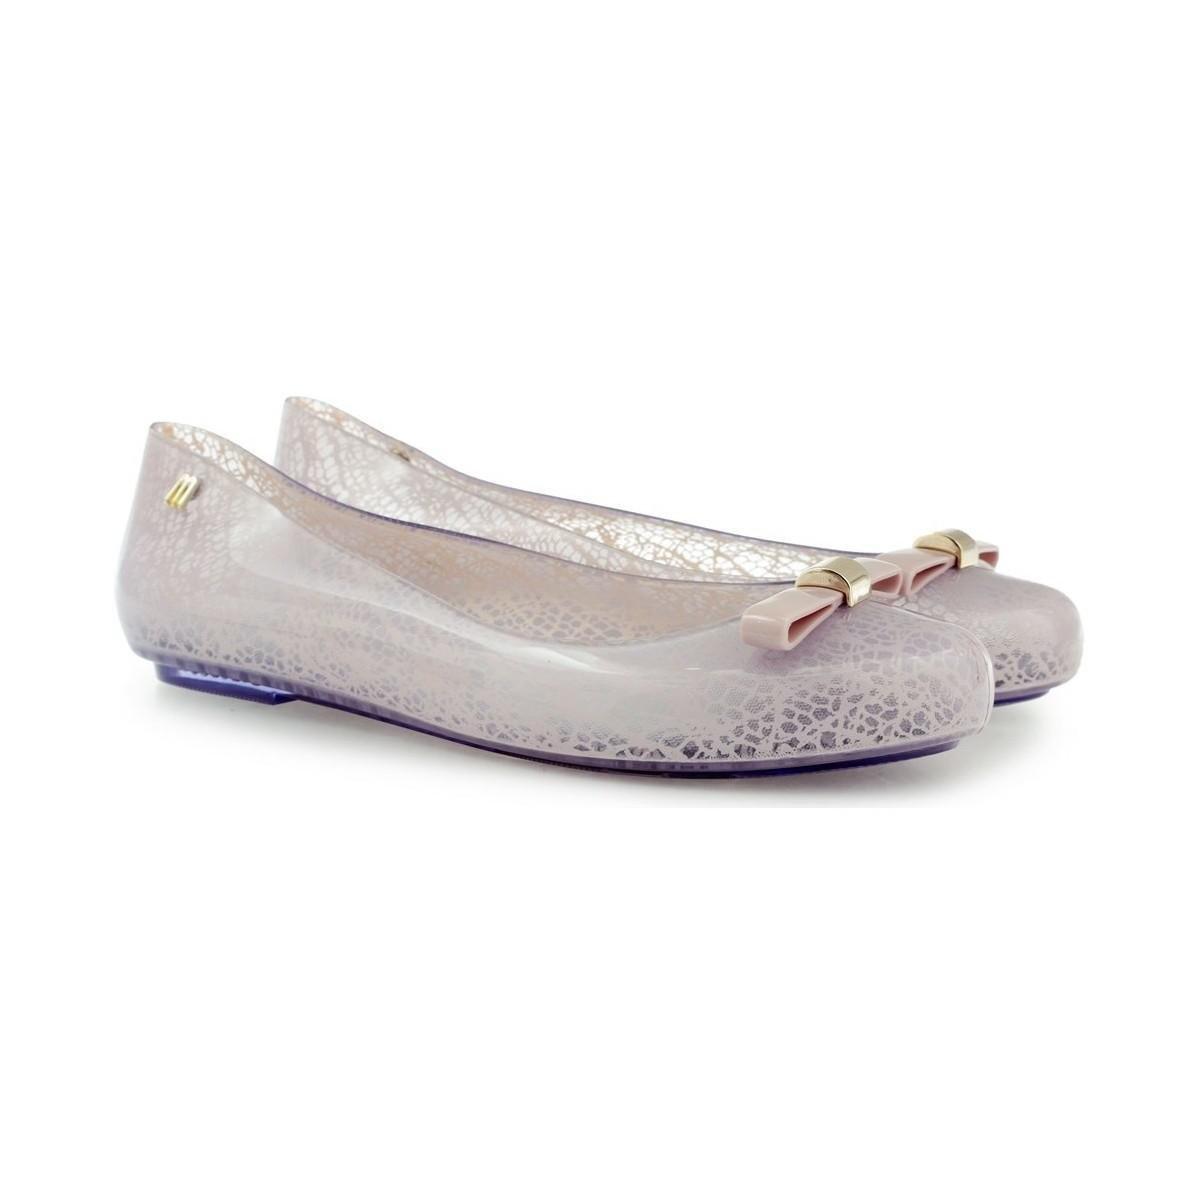 Big Sale For Sale Melissa SPACE LOVE women's Shoes (Pumps / Ballerinas) in Latest Collections Online FlKXLVe6